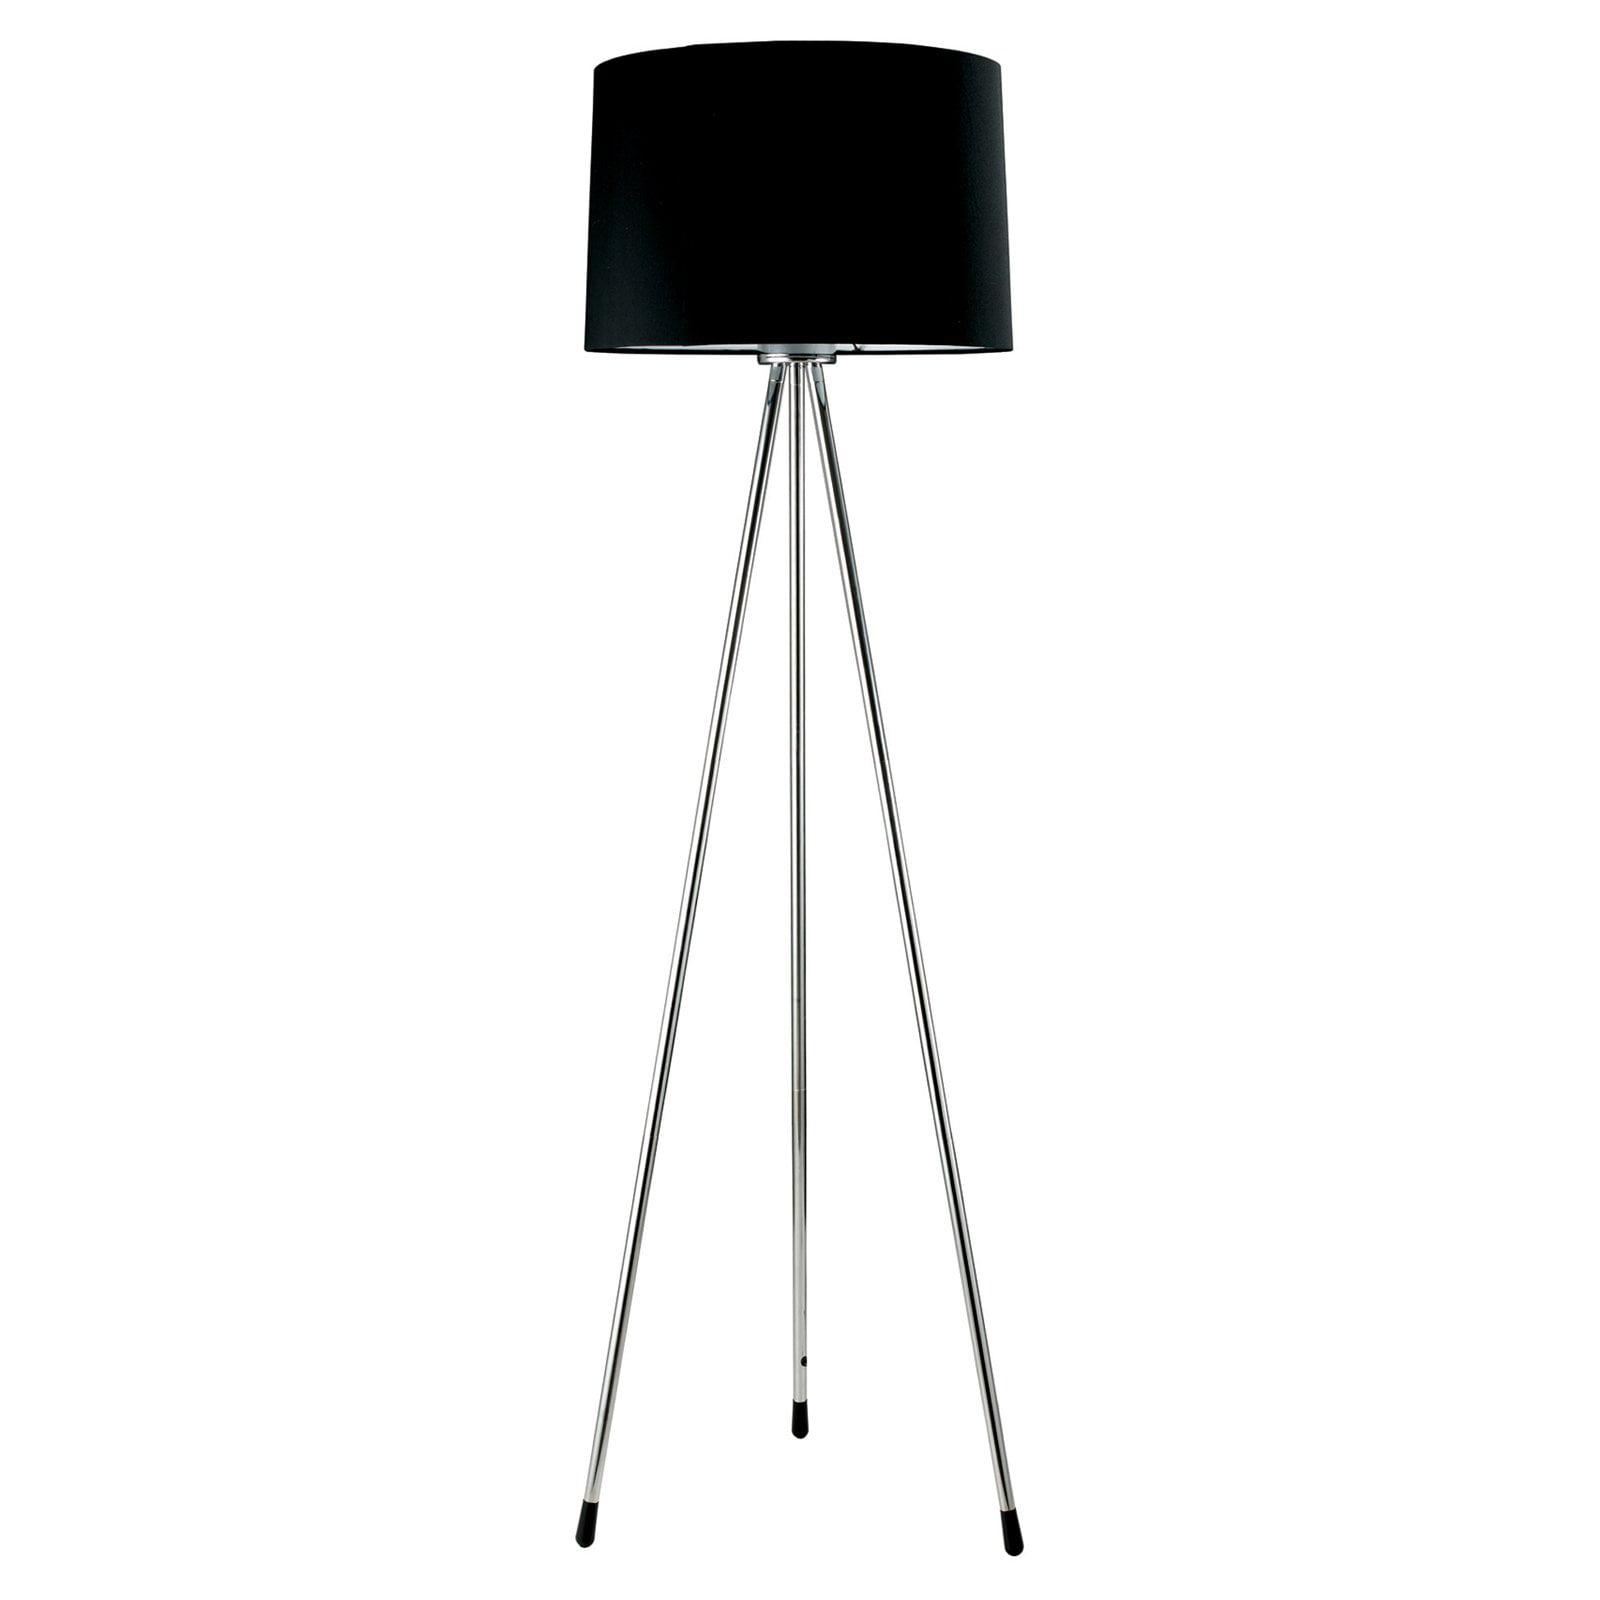 Ore International 3-Leg Floor Lamp, Black - Walmart.com